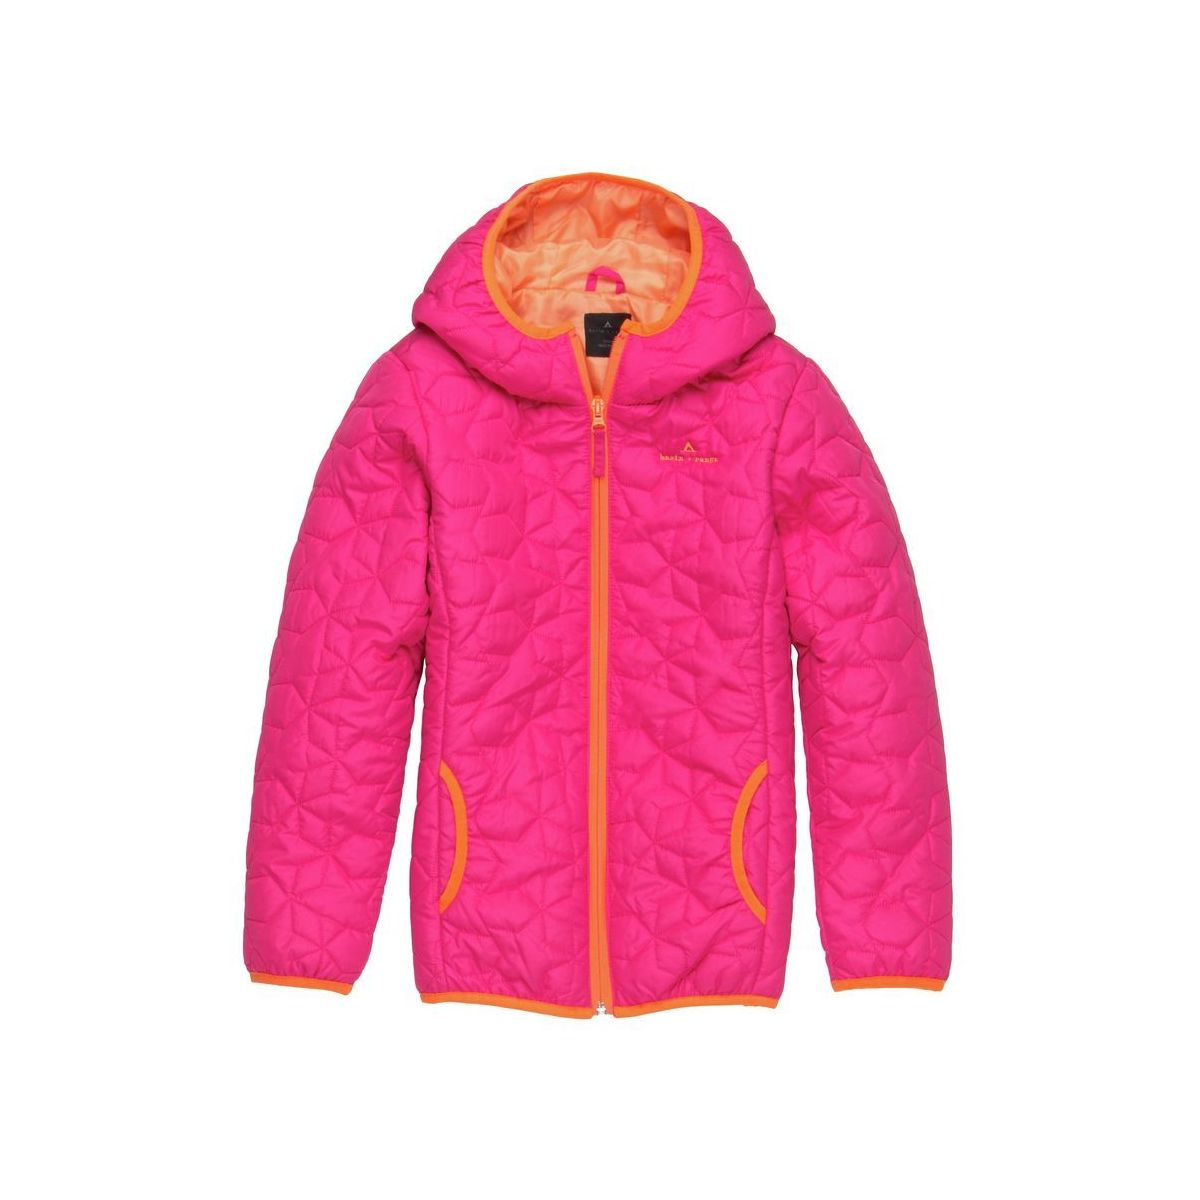 bandr Round Valley Insulated Jacket  Girls